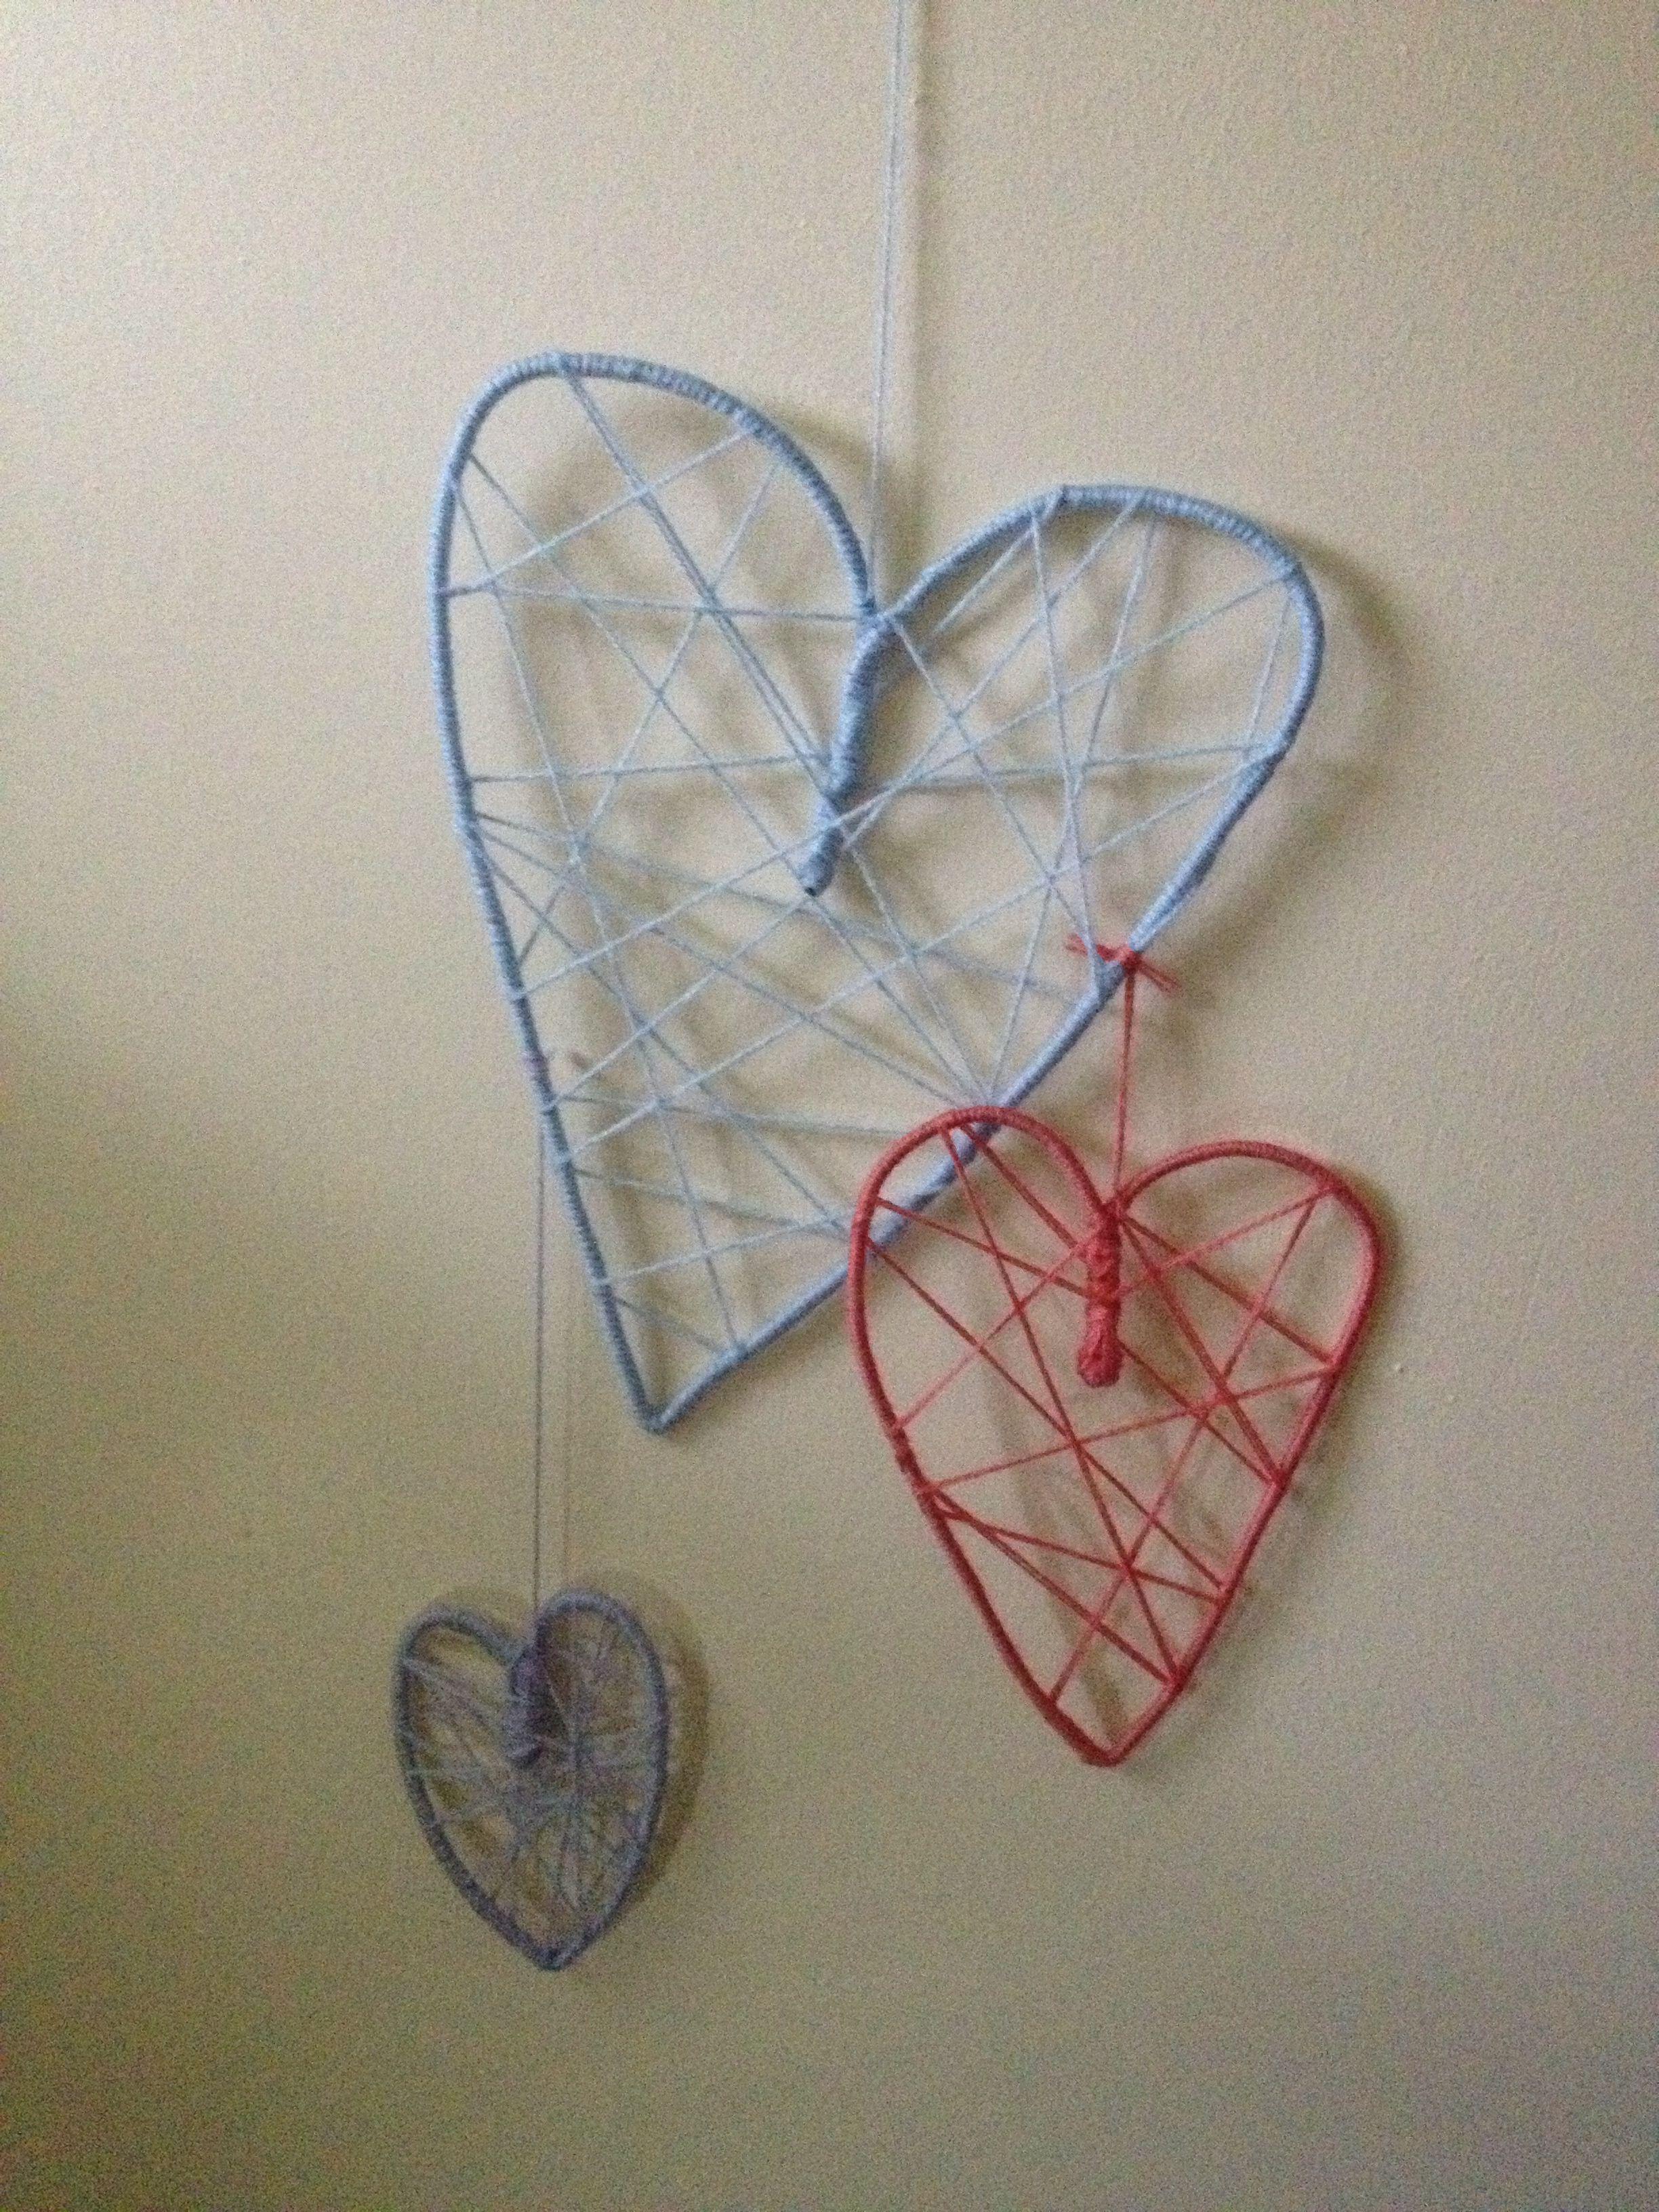 Wool Heart Decorations